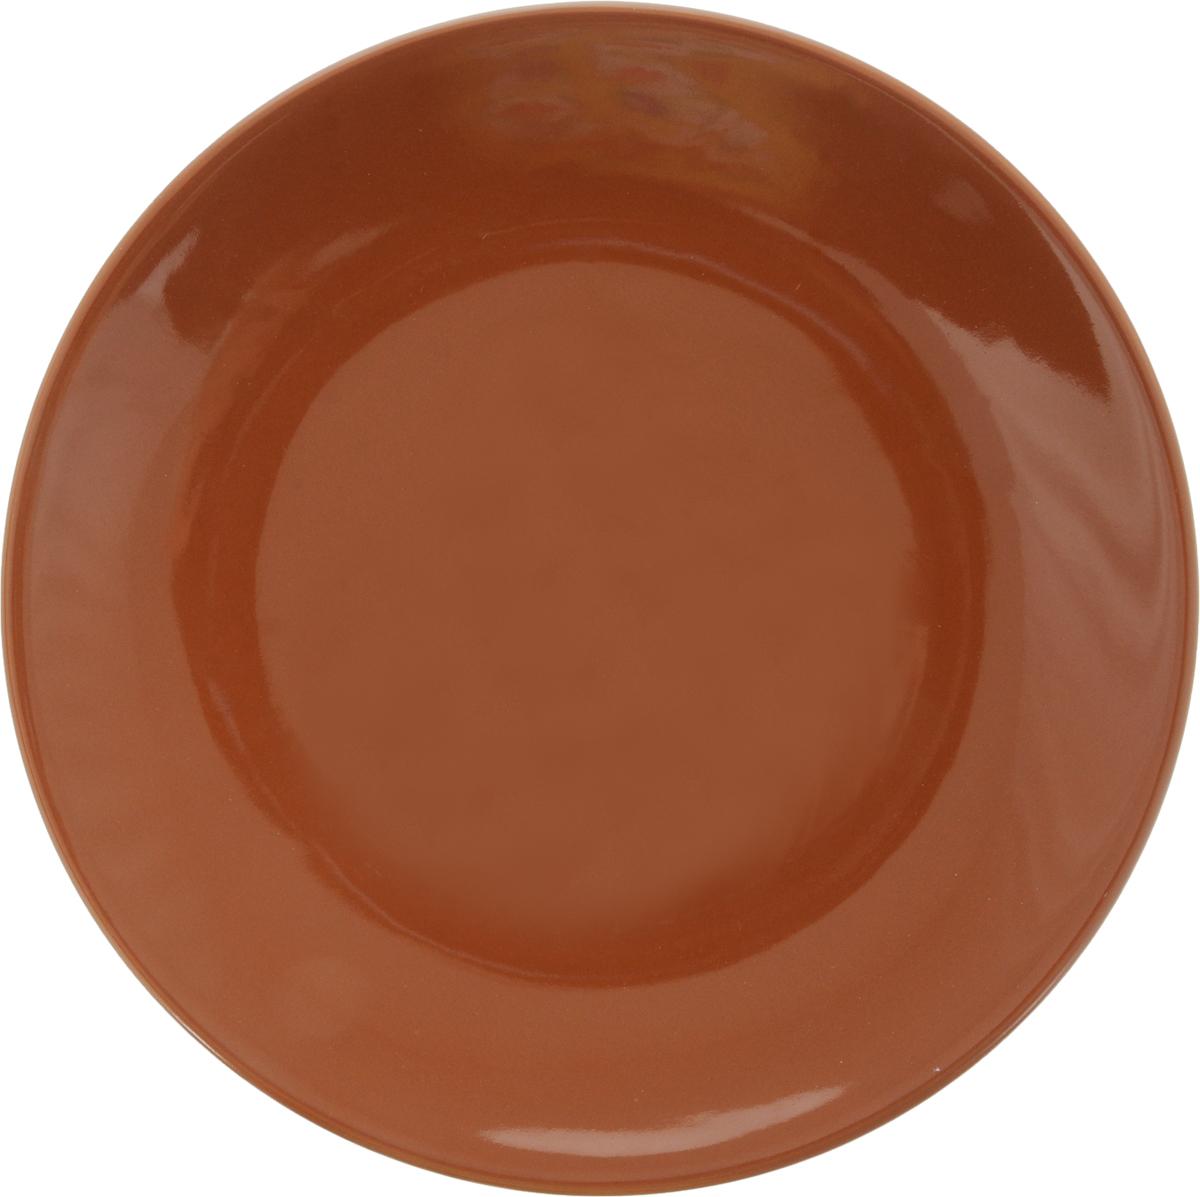 Тарелка десертная Ломоносовская керамика, диаметр 21 см dimplex камин venice hesford